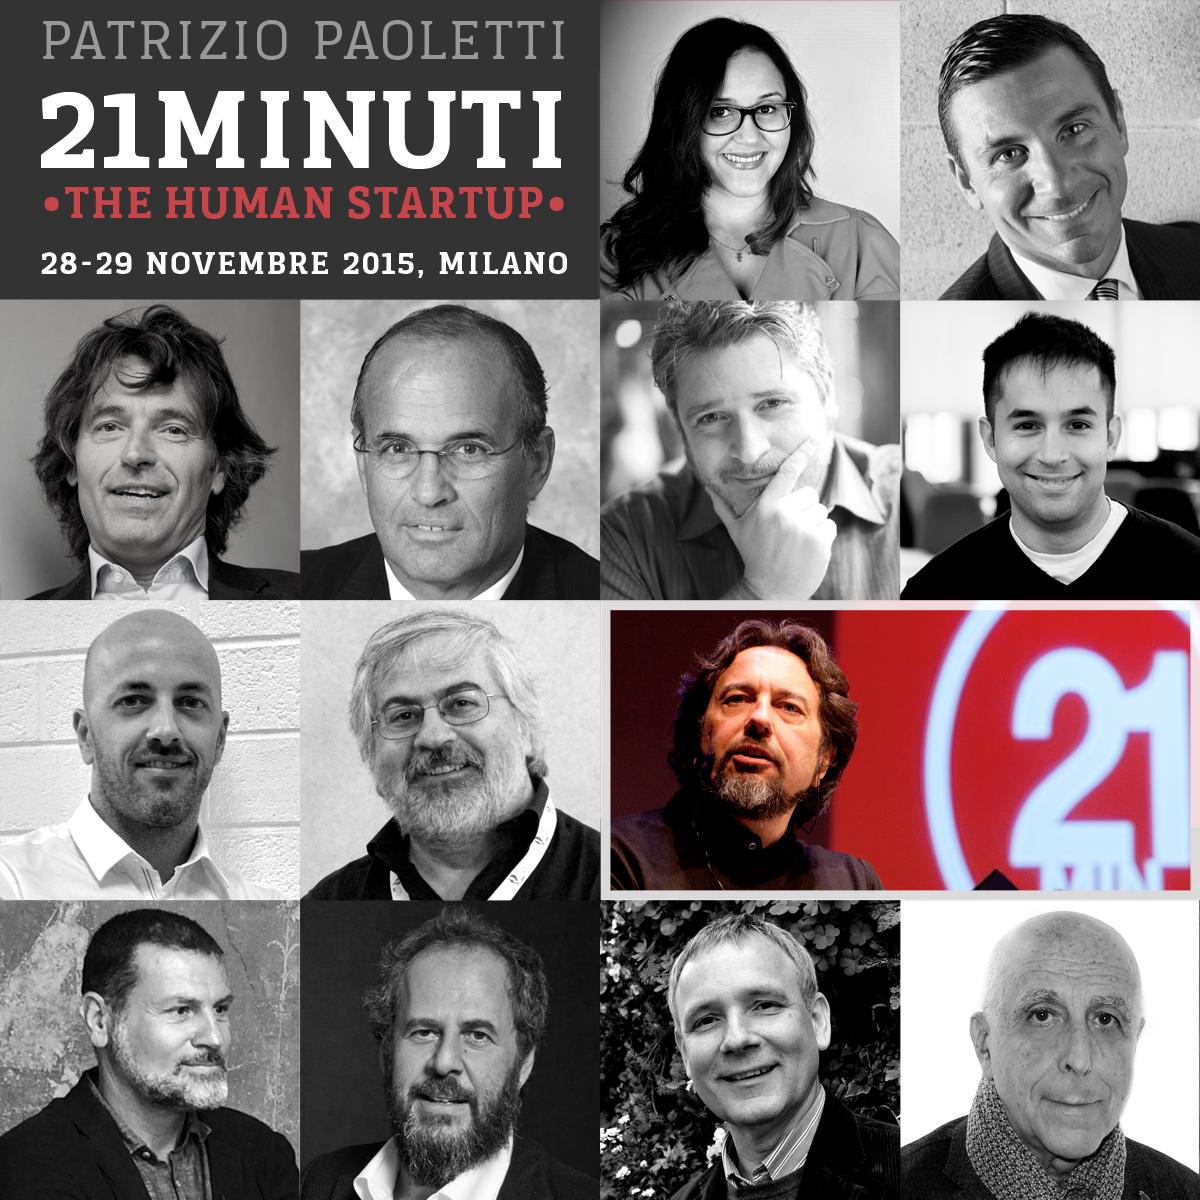 21 Minuti - The Human Startup